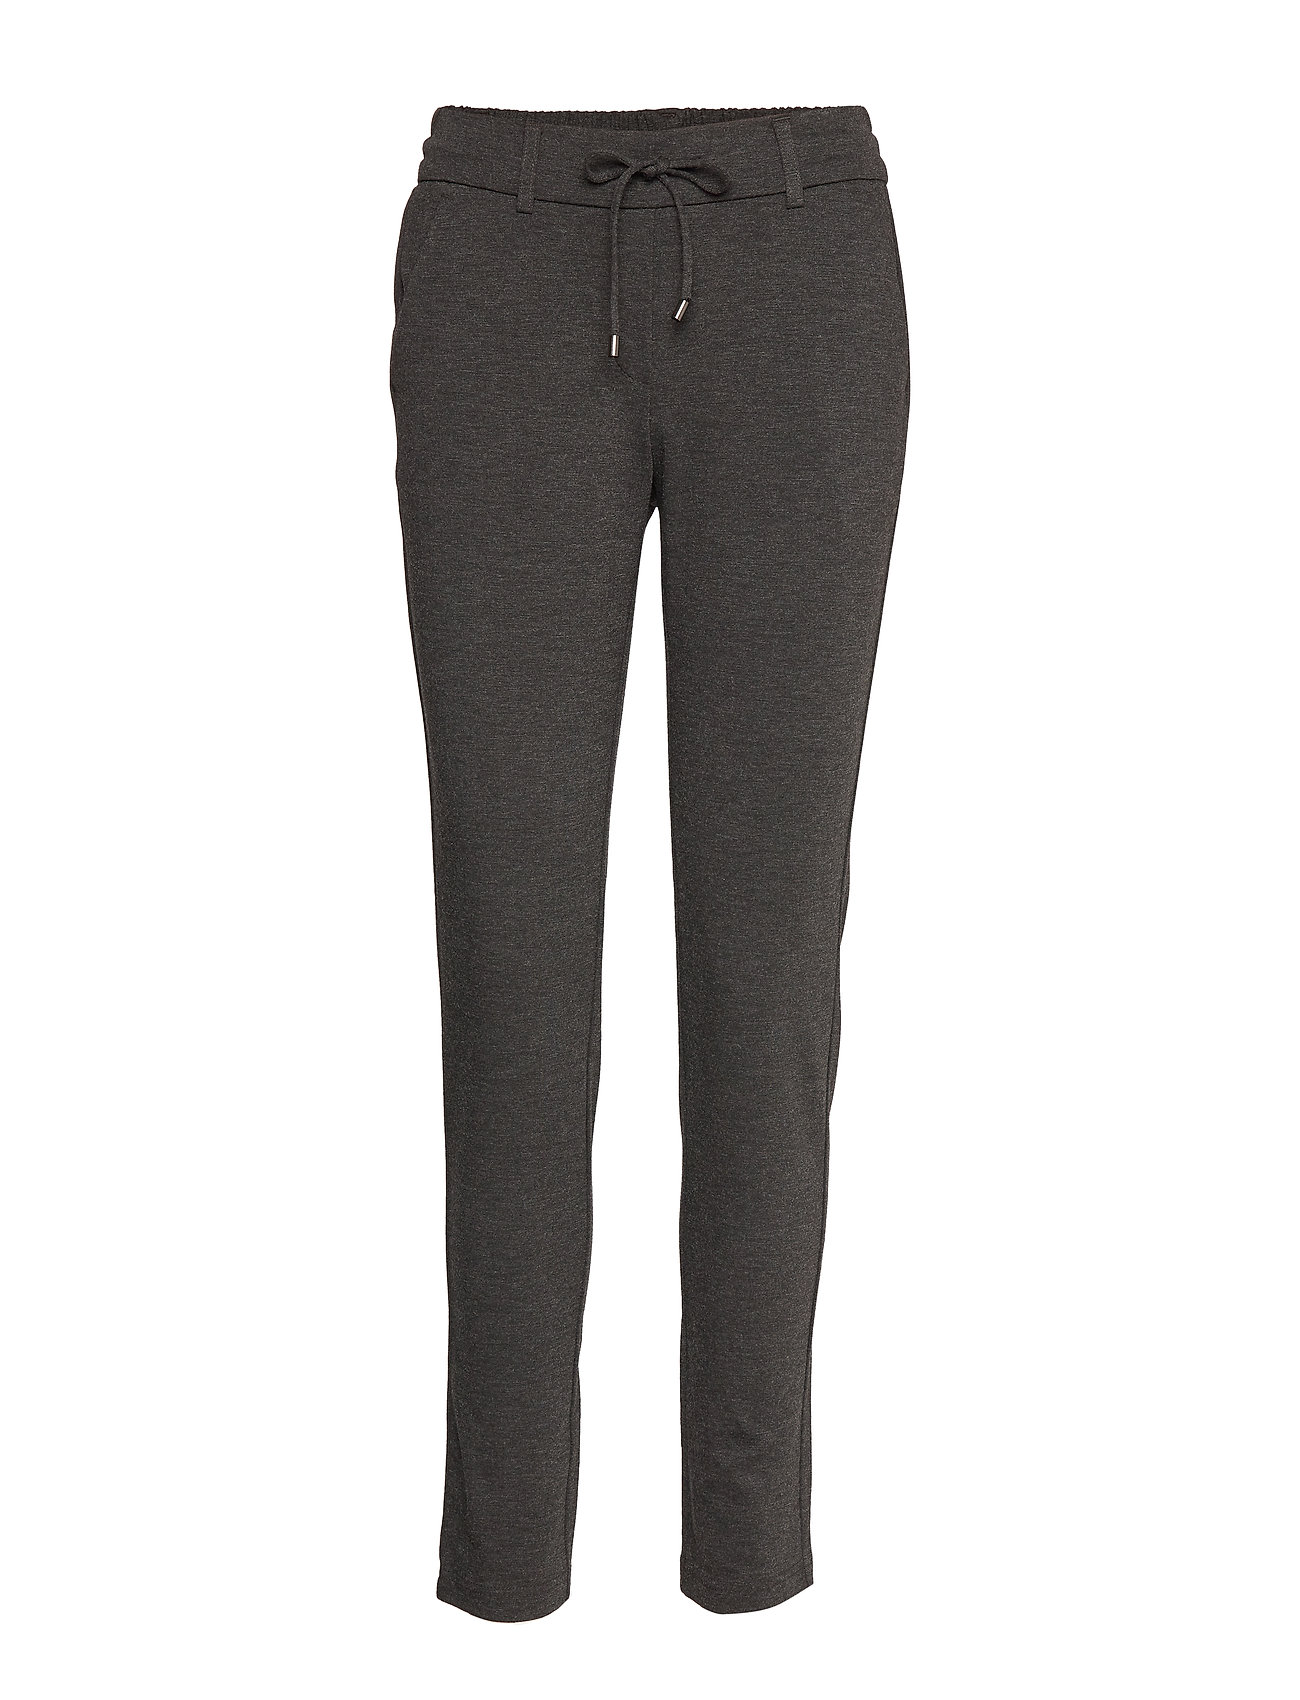 Brandtex Casual pants - GREY MELL.